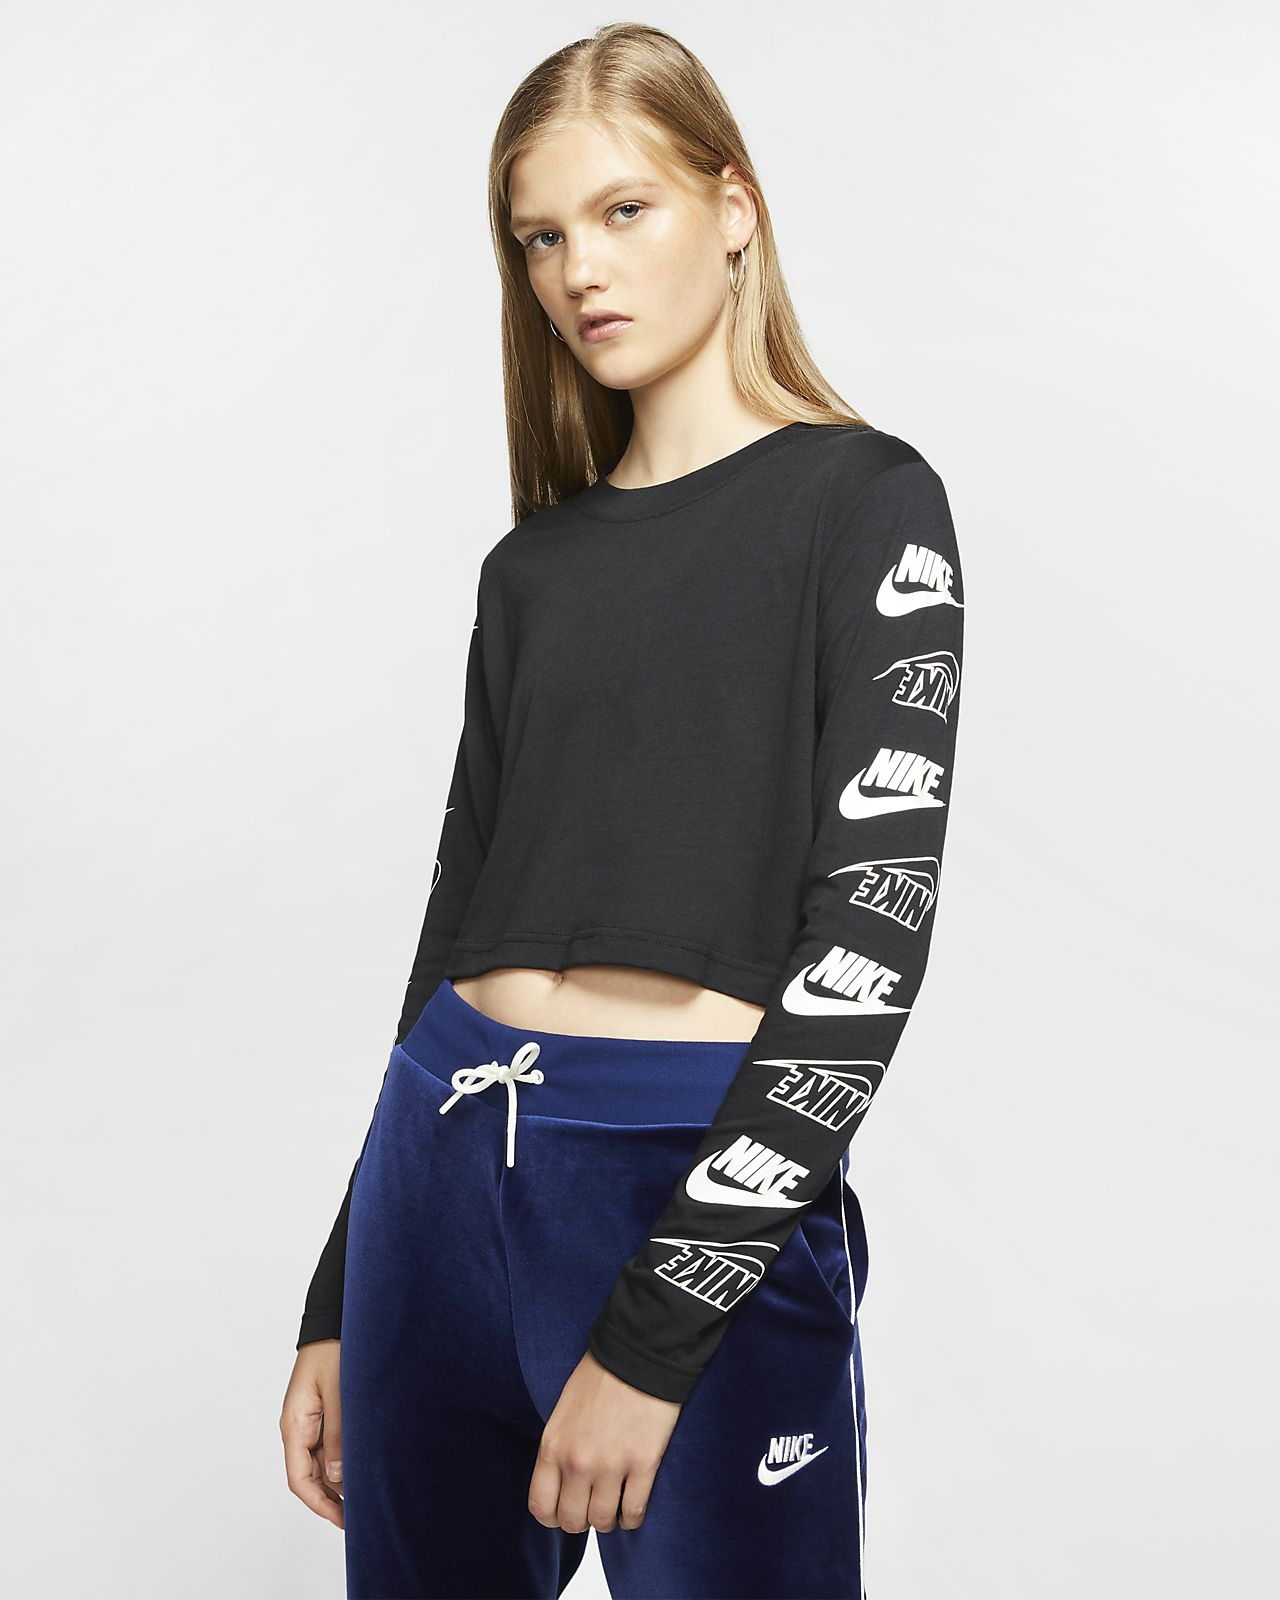 Camisola de manga comprida Nike Sportswear para mulher